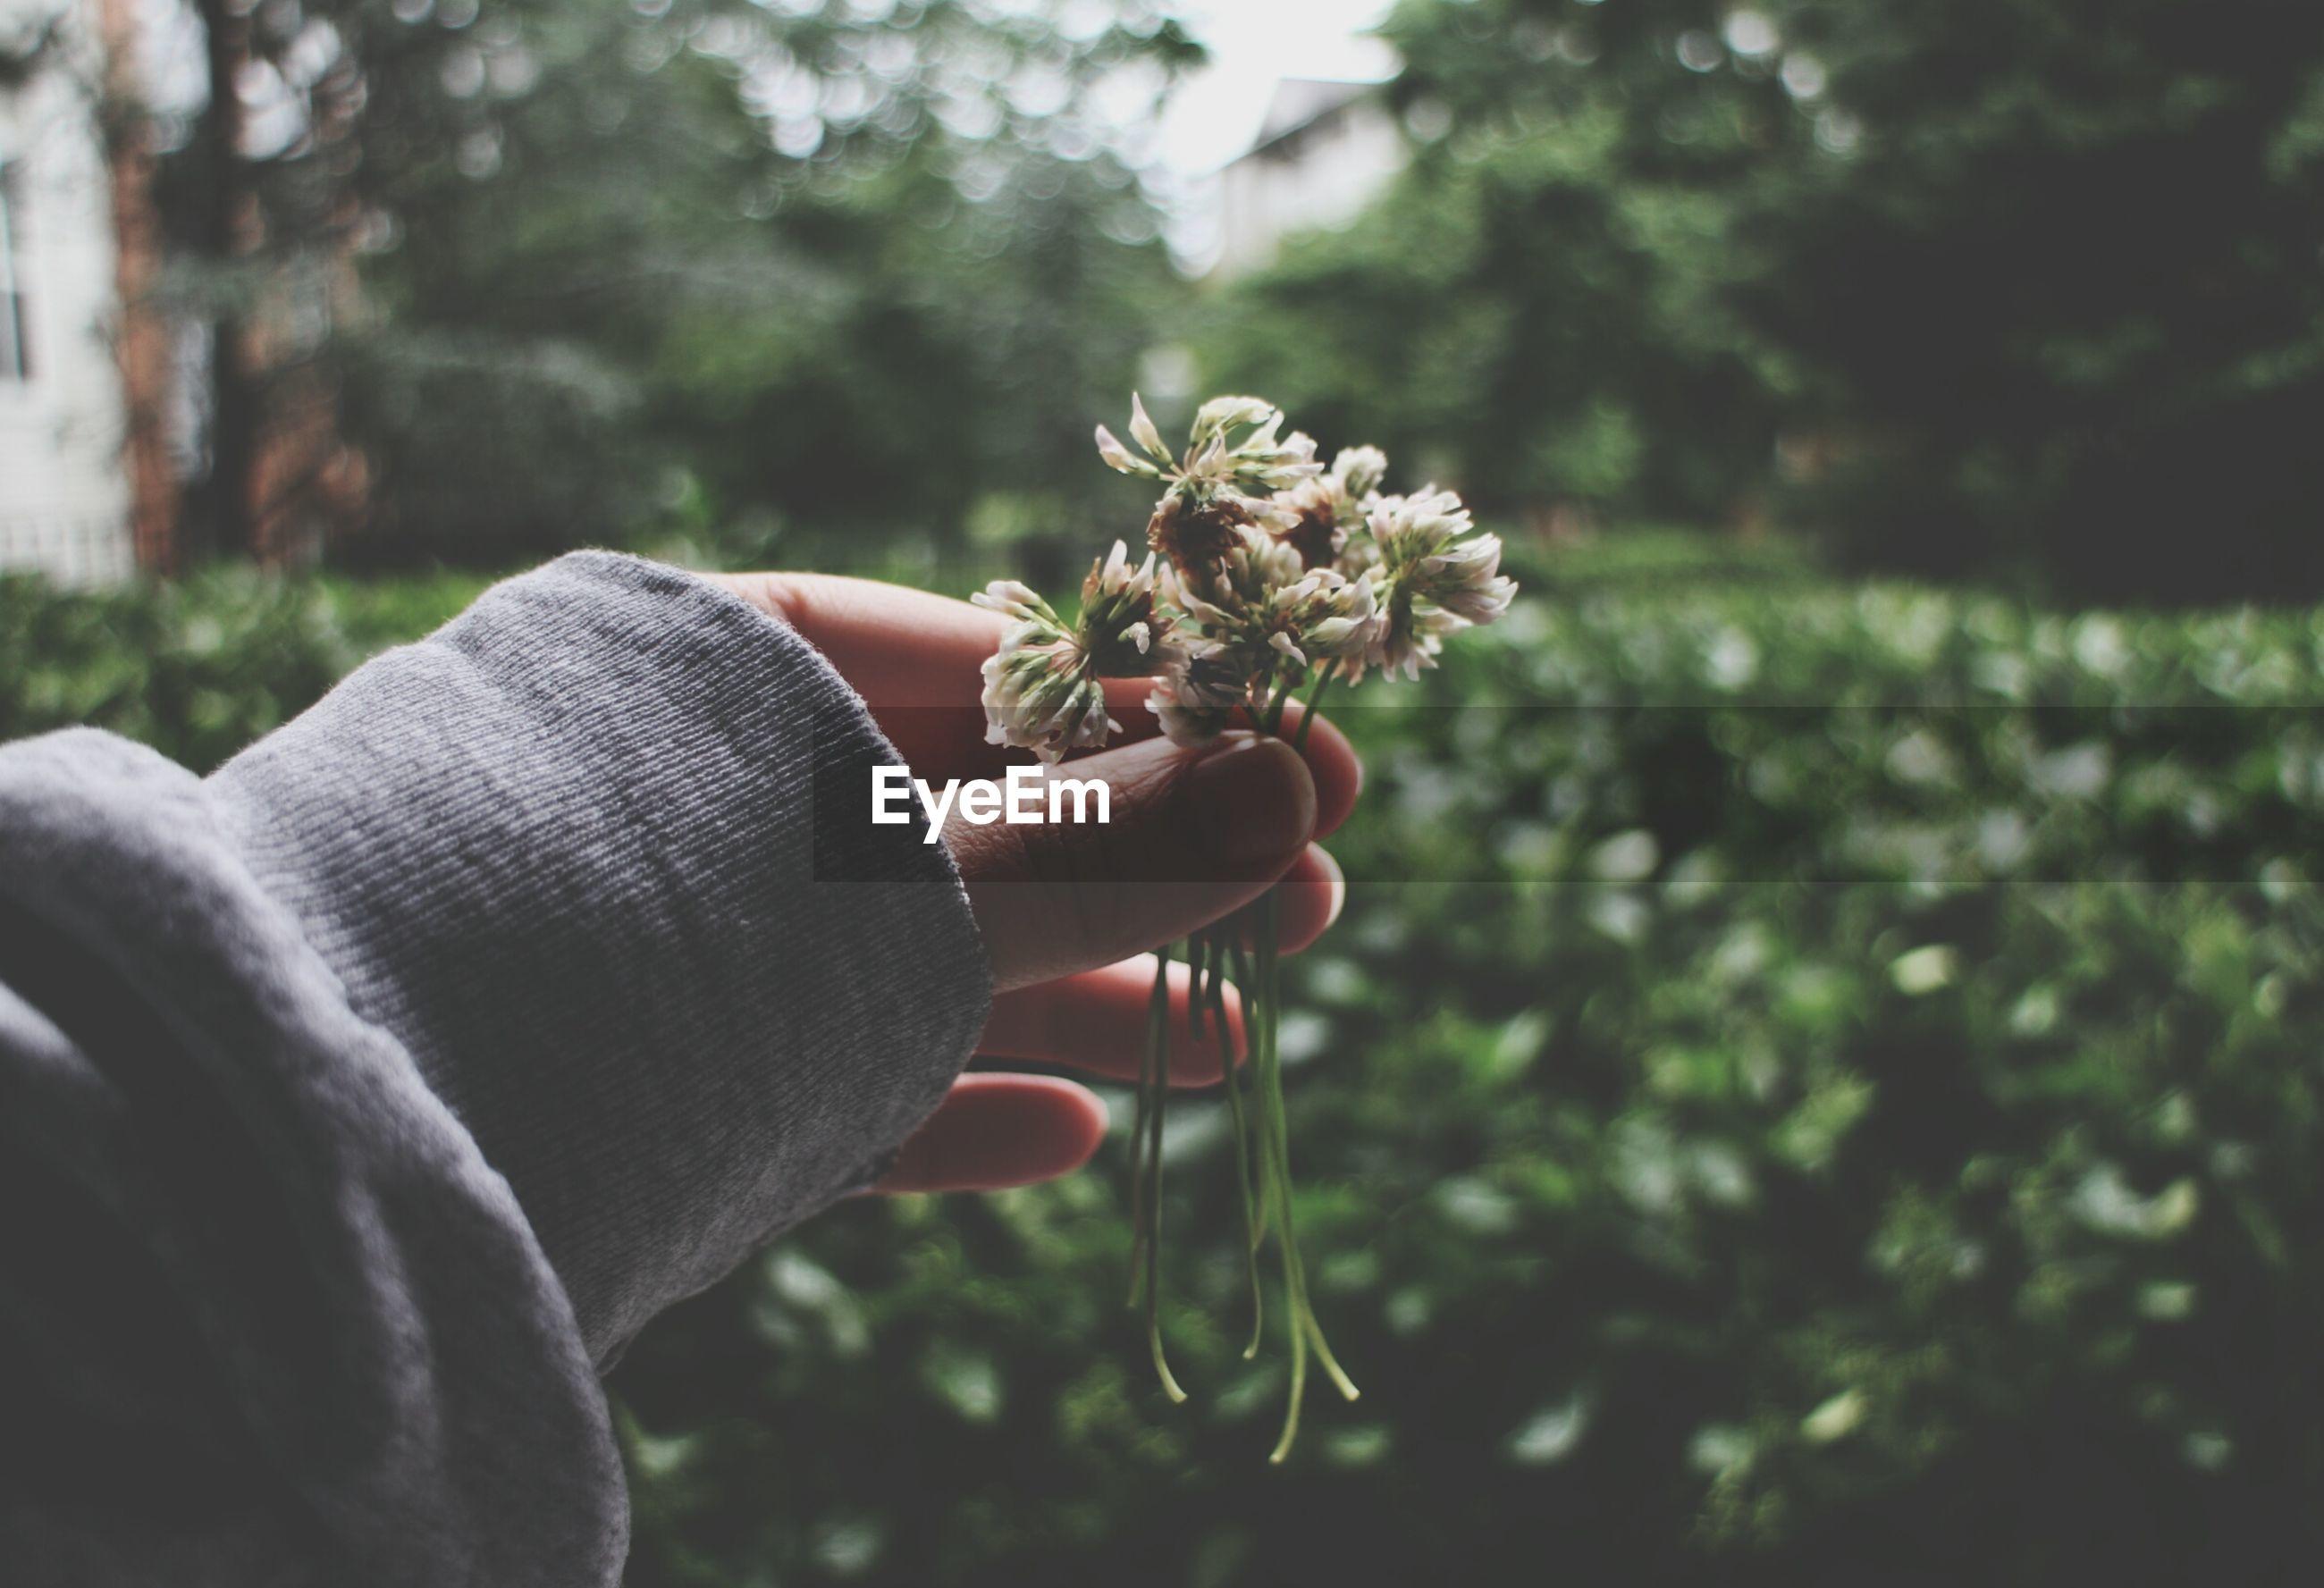 Human hand holding flower